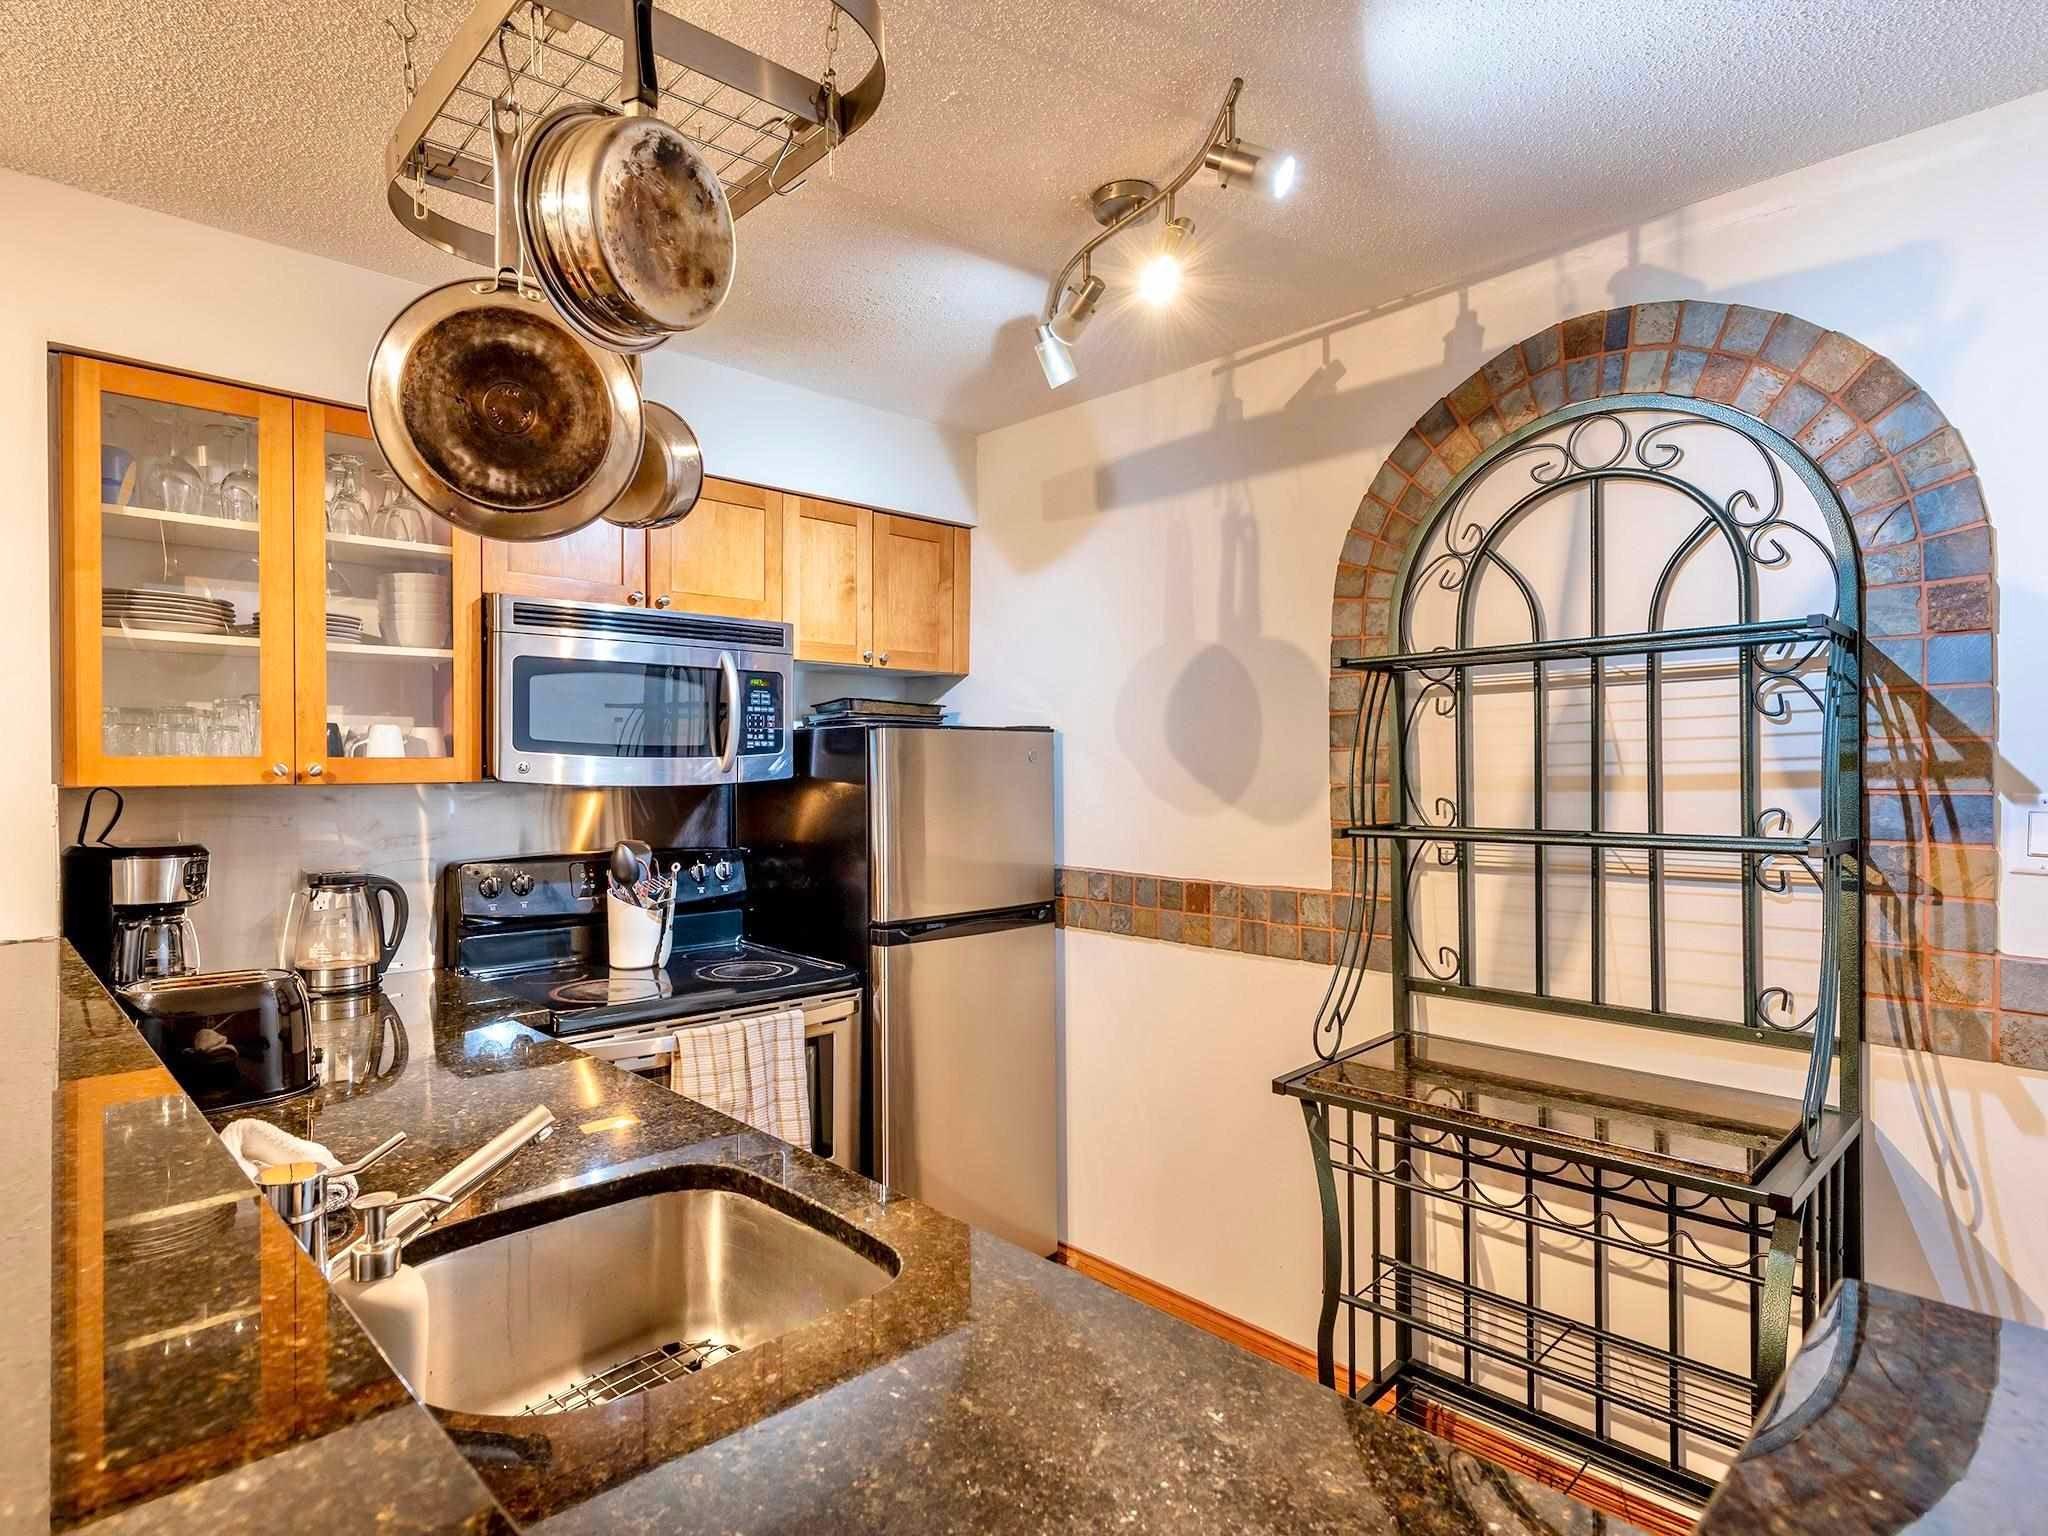 73 4388 NORTHLANDS BOULEVARD - Whistler Village Townhouse for sale, 2 Bedrooms (R2580863) - #8